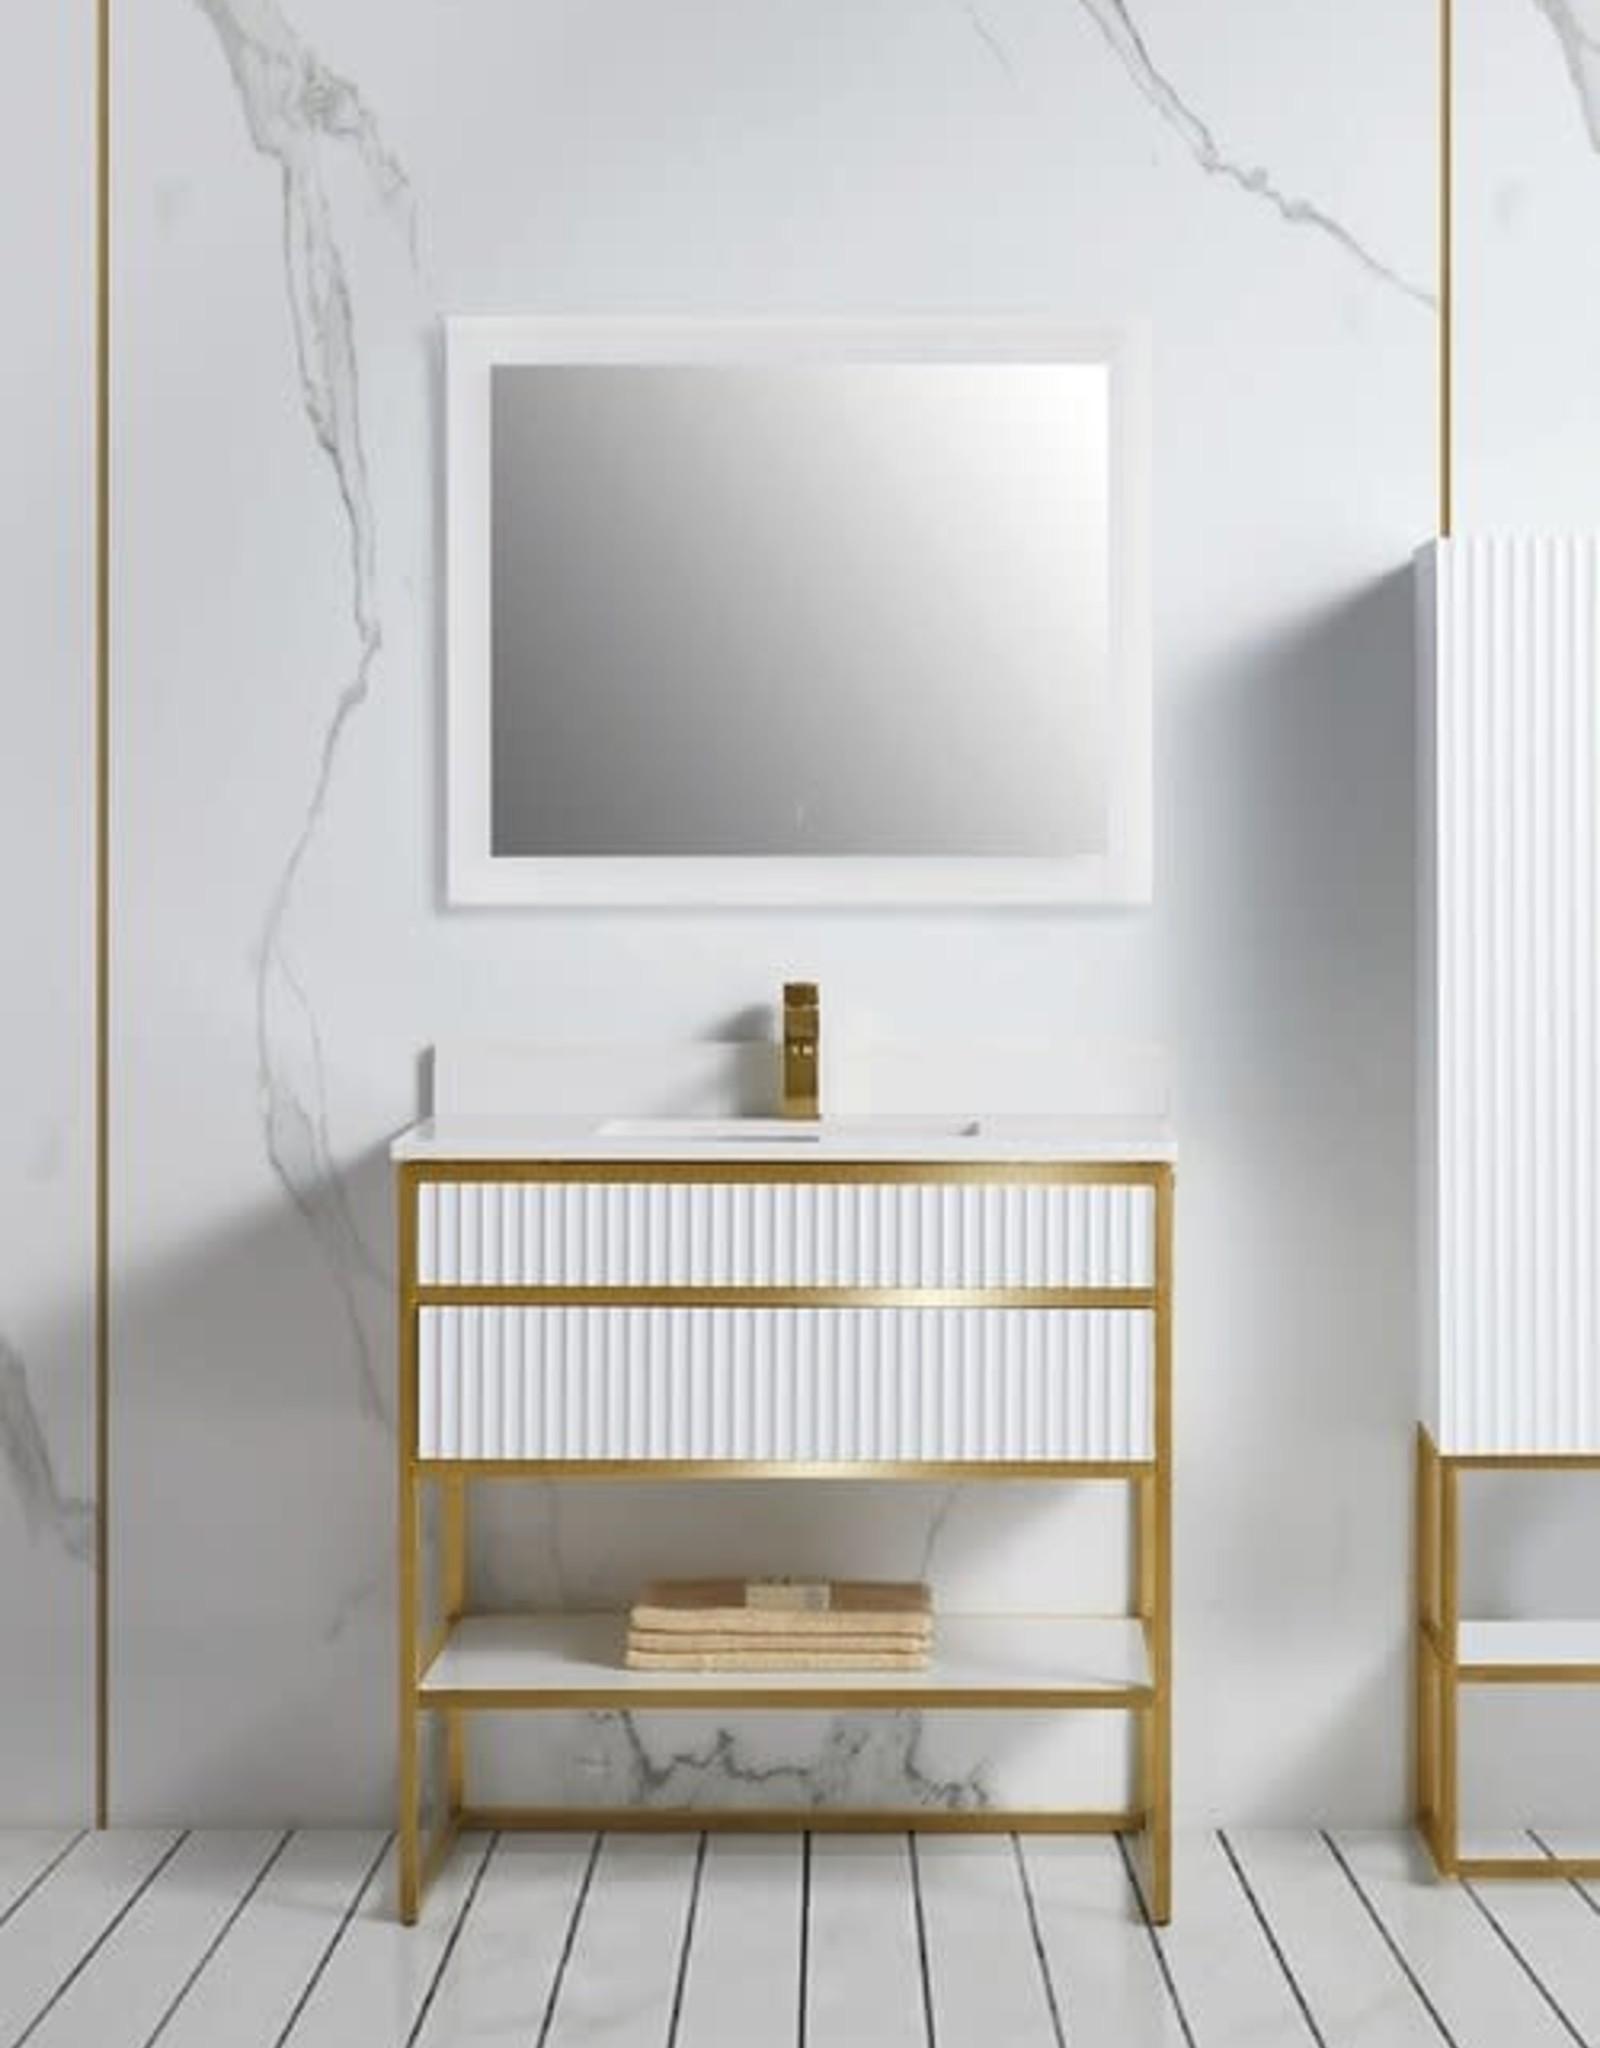 Bagno Italia Bagno Italia Geneva Vanity w/ White Quartz Top